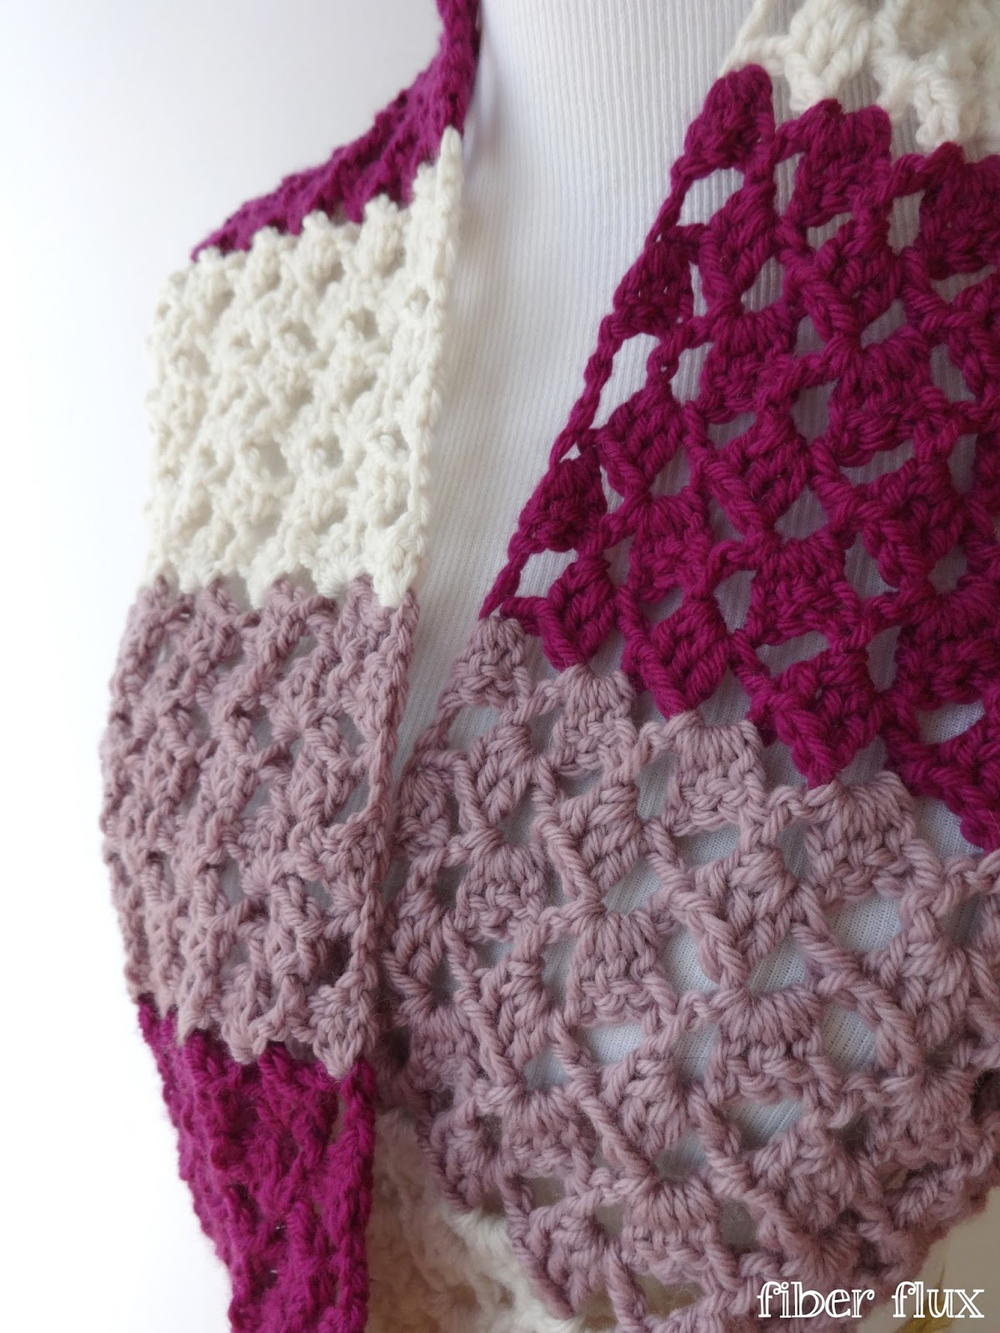 Striped Raspberry Crochet Infinity Scarf Allfreecrochet Com